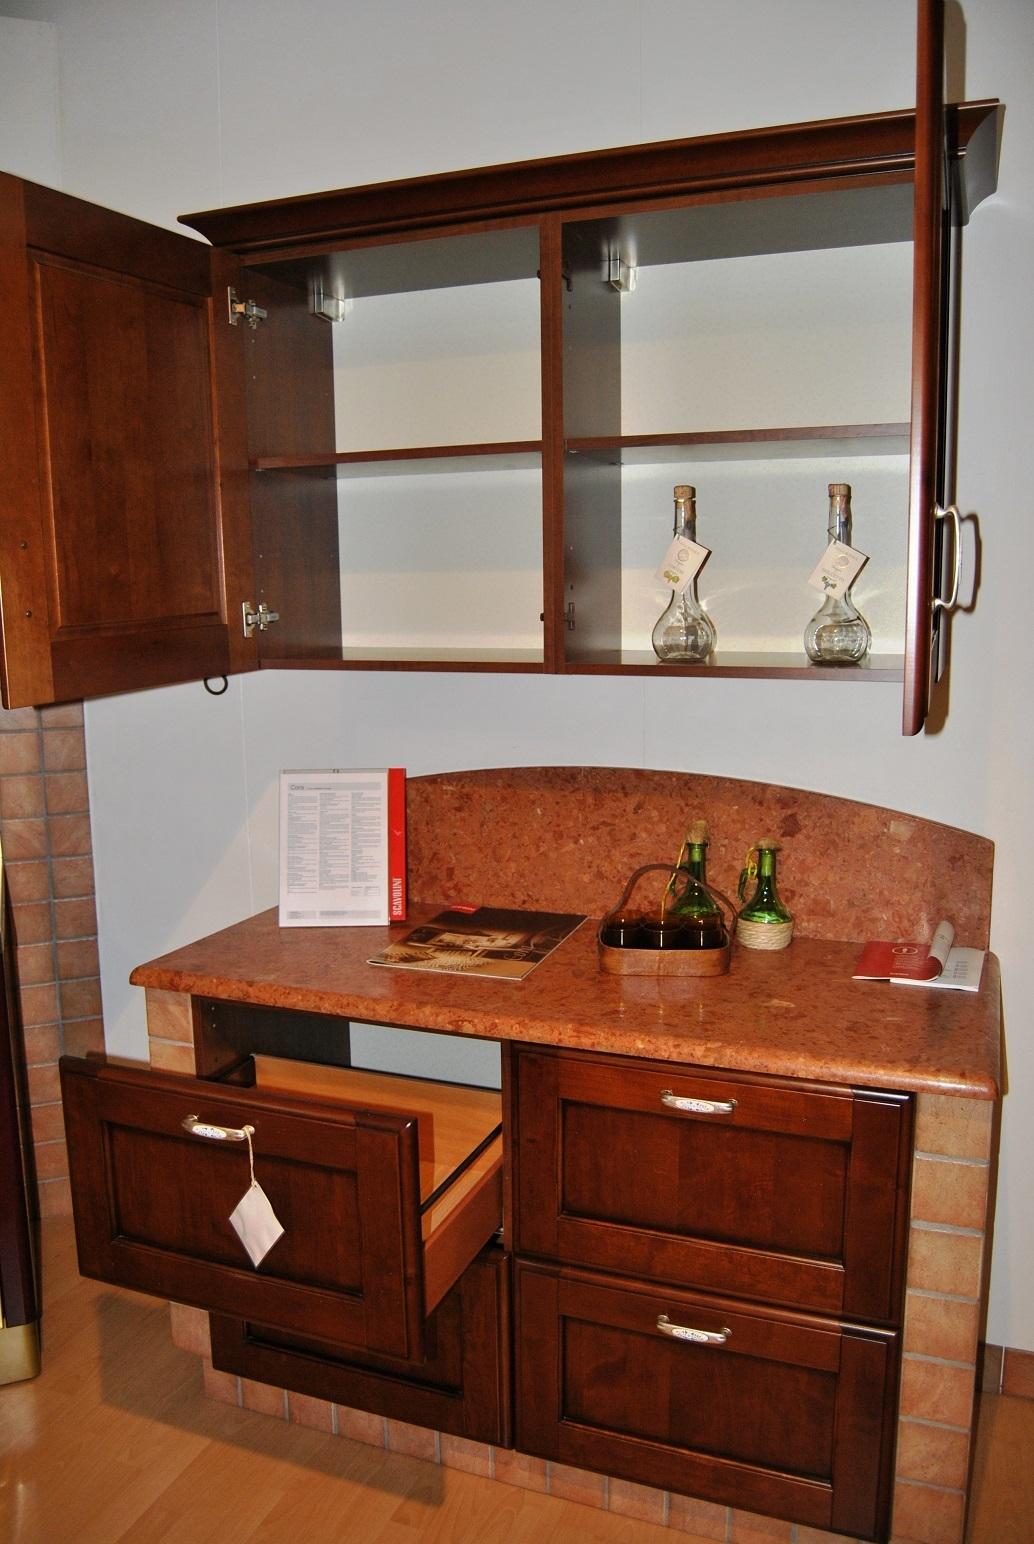 Scavolini cucina cora cucine a prezzi scontati - Cucine in muratura scavolini ...